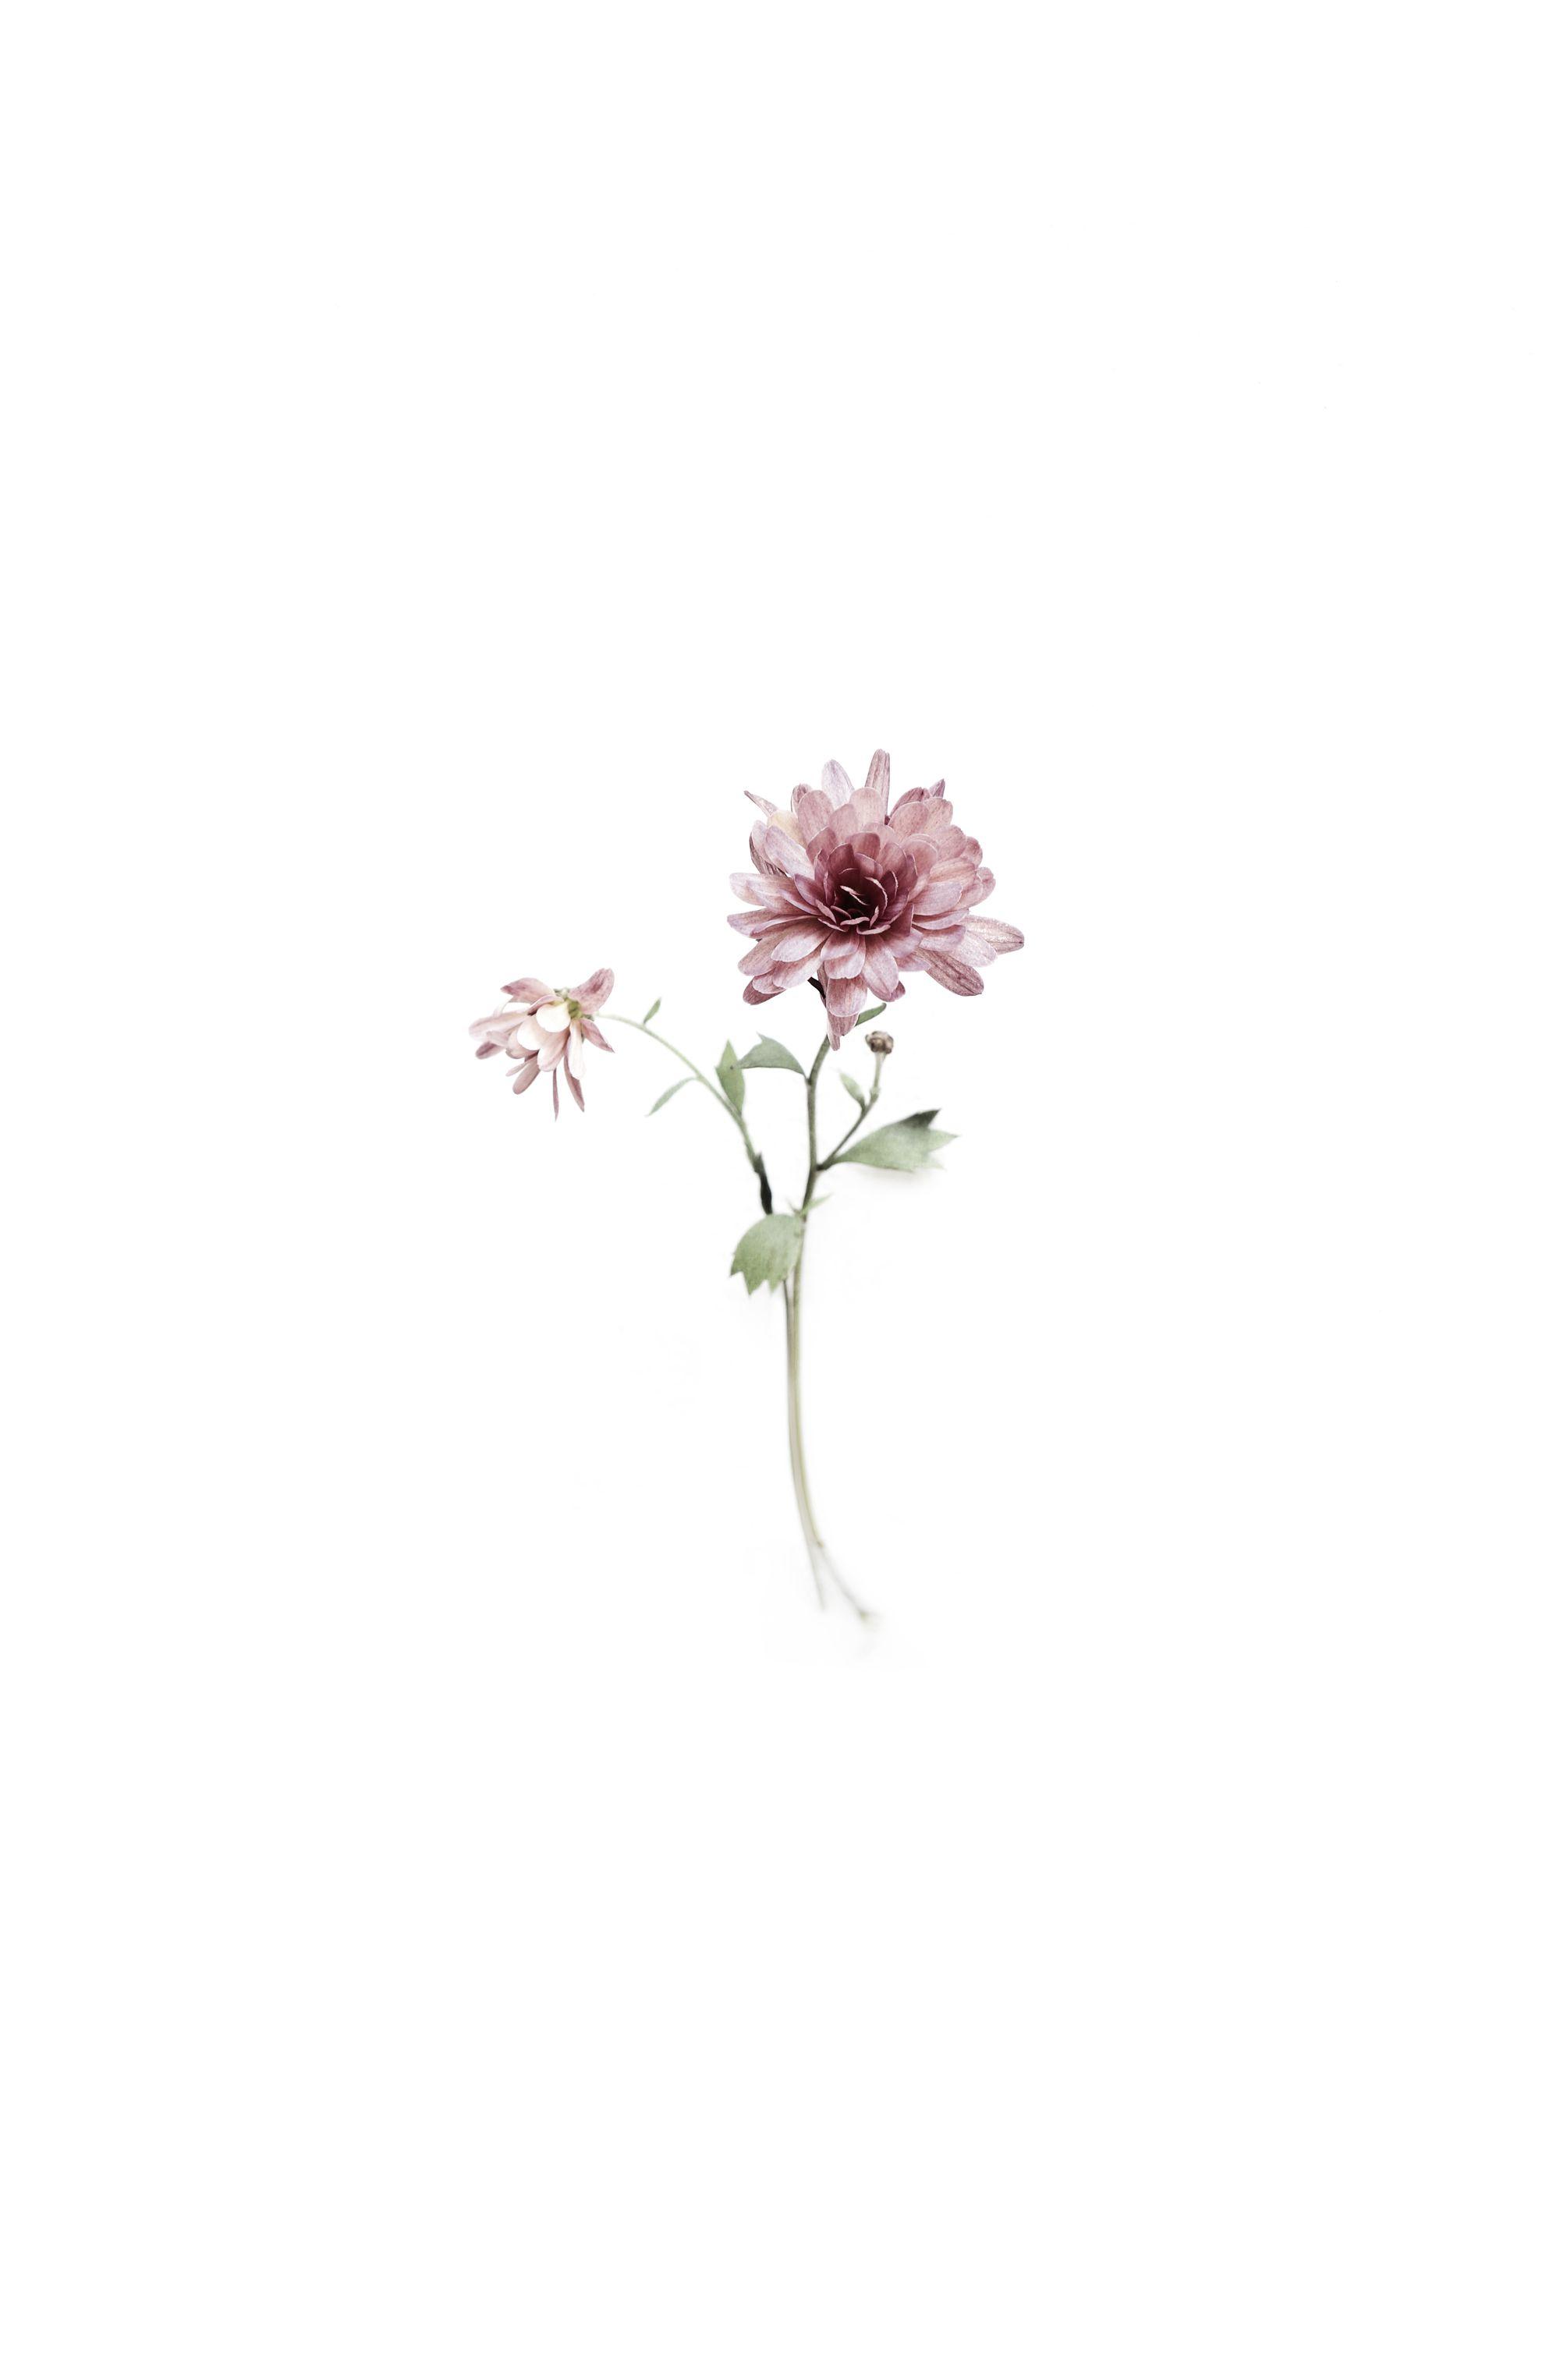 Mum Still Mary Jo Hoffman Flowers Instagram Floral Prints Art Flower Icons